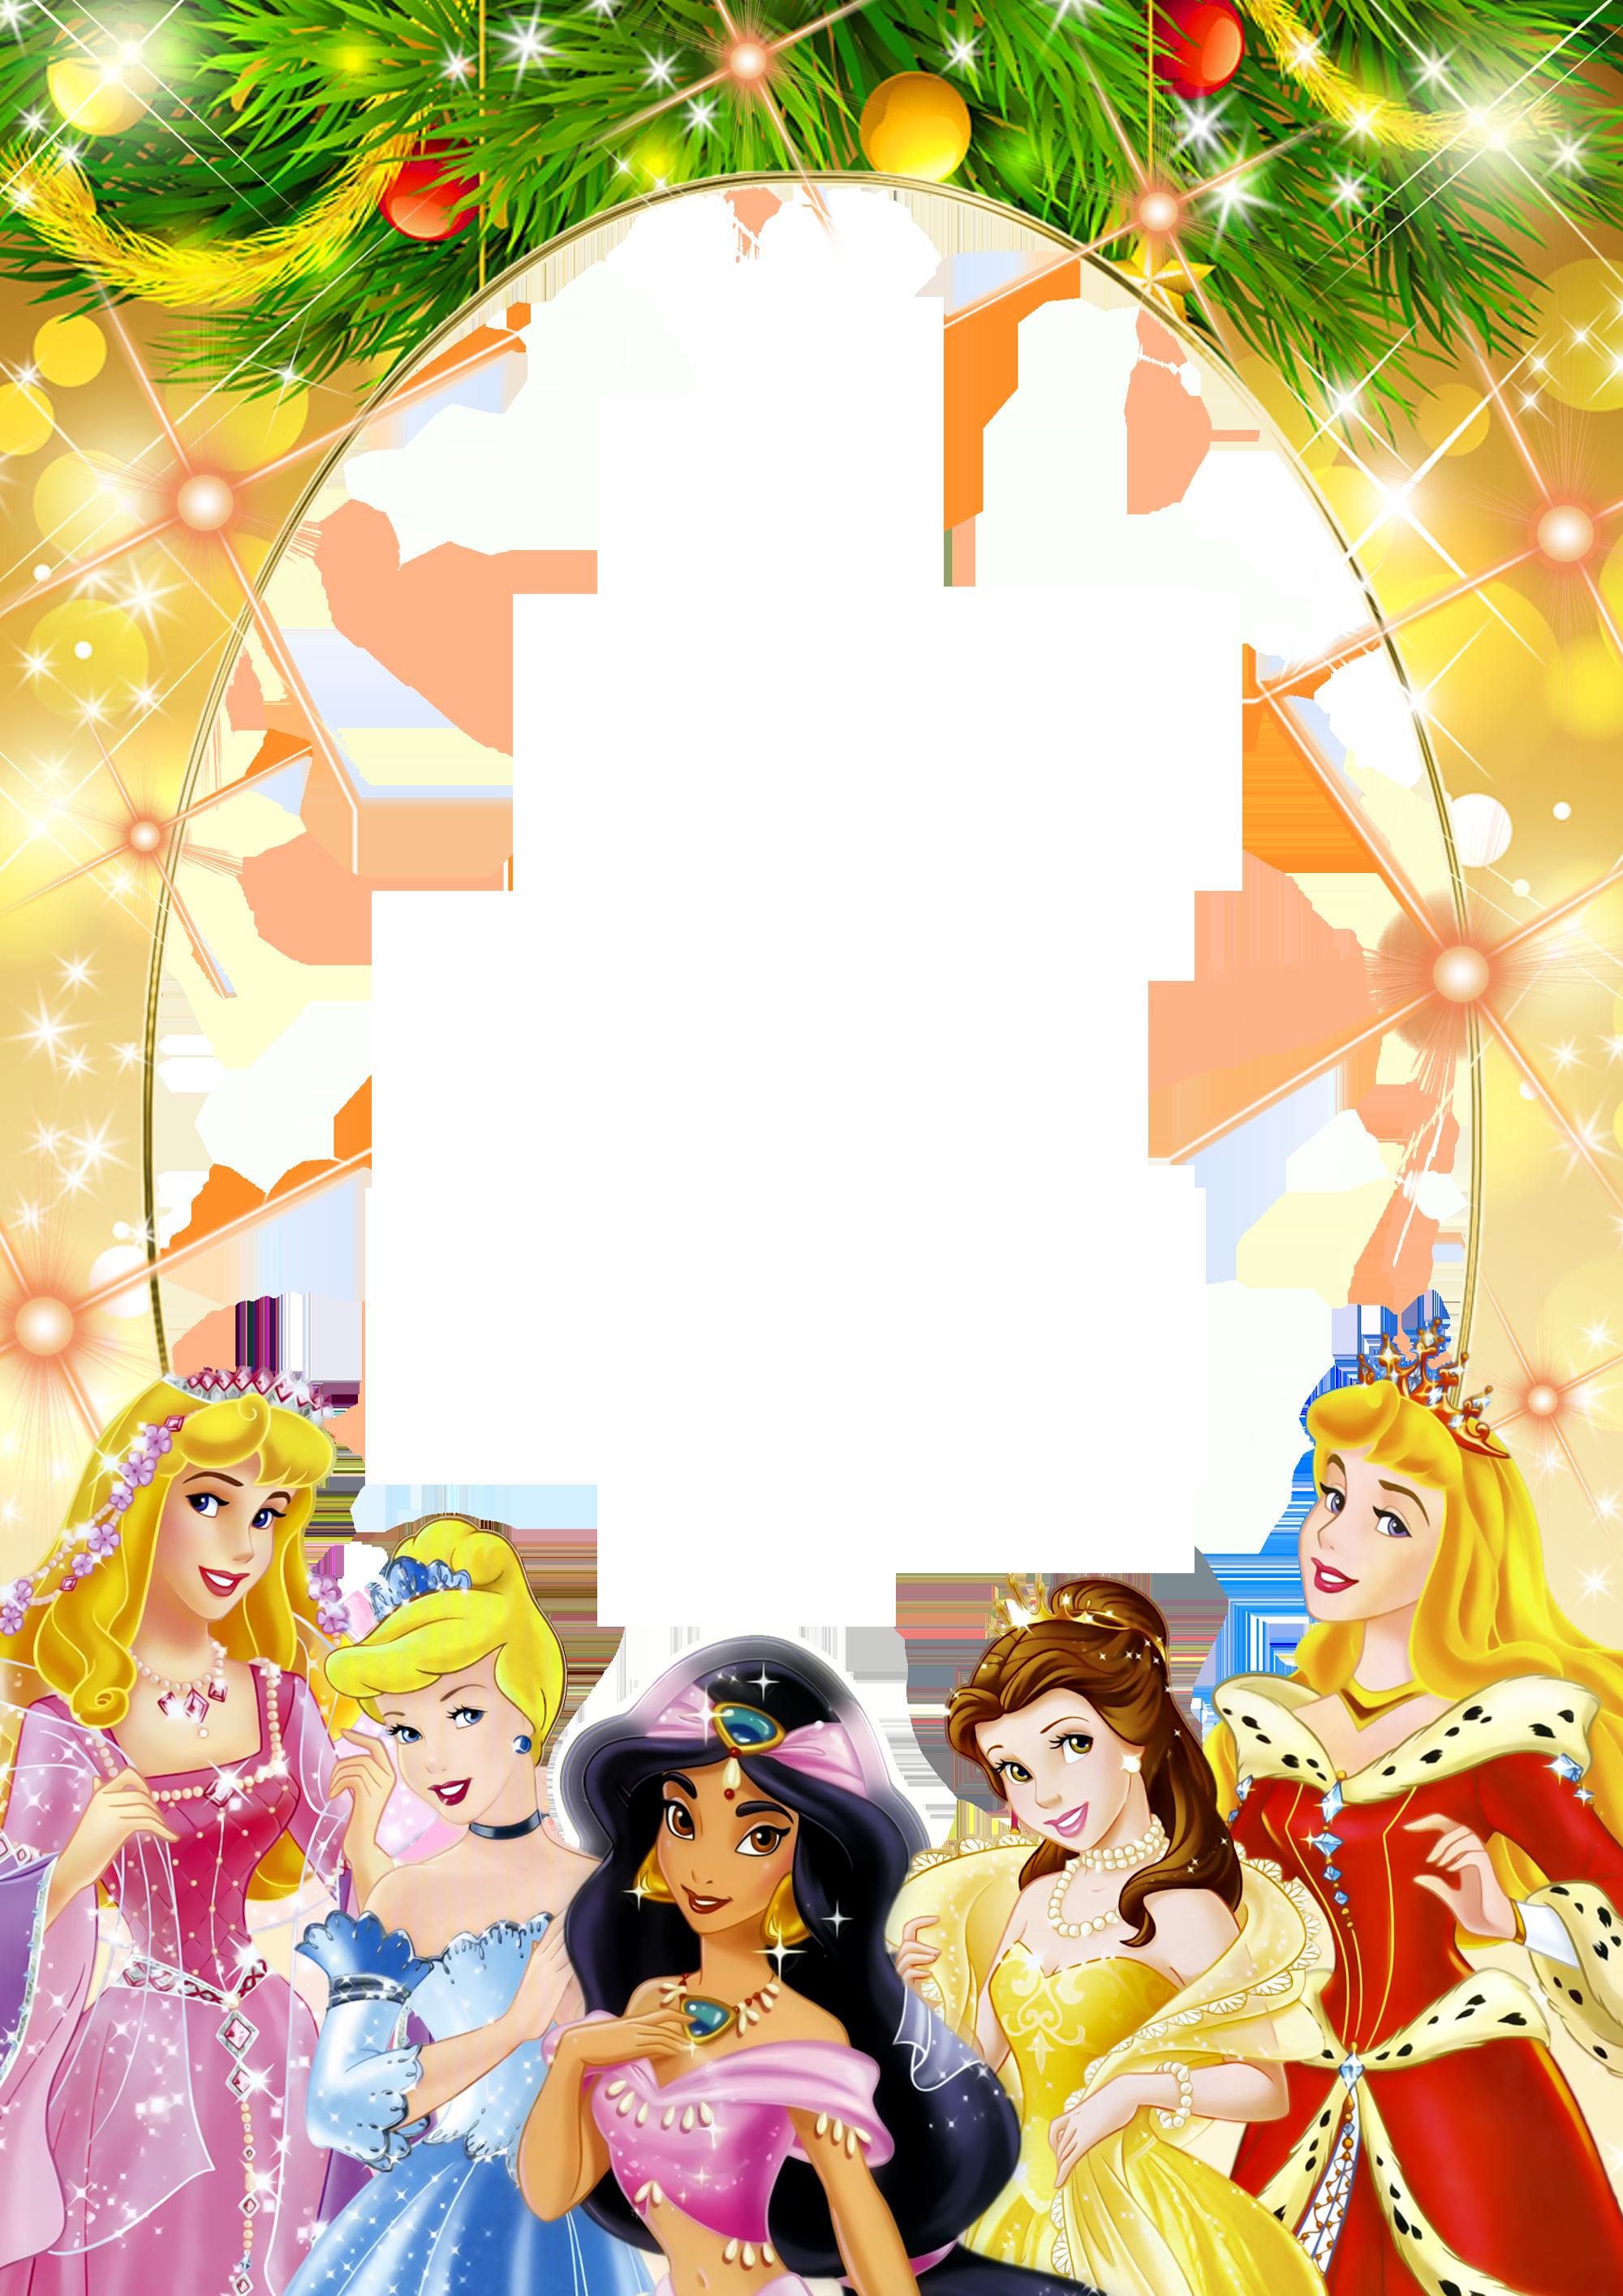 Transparent Kids PNG Frame with Christmas Princesses | Printables ...